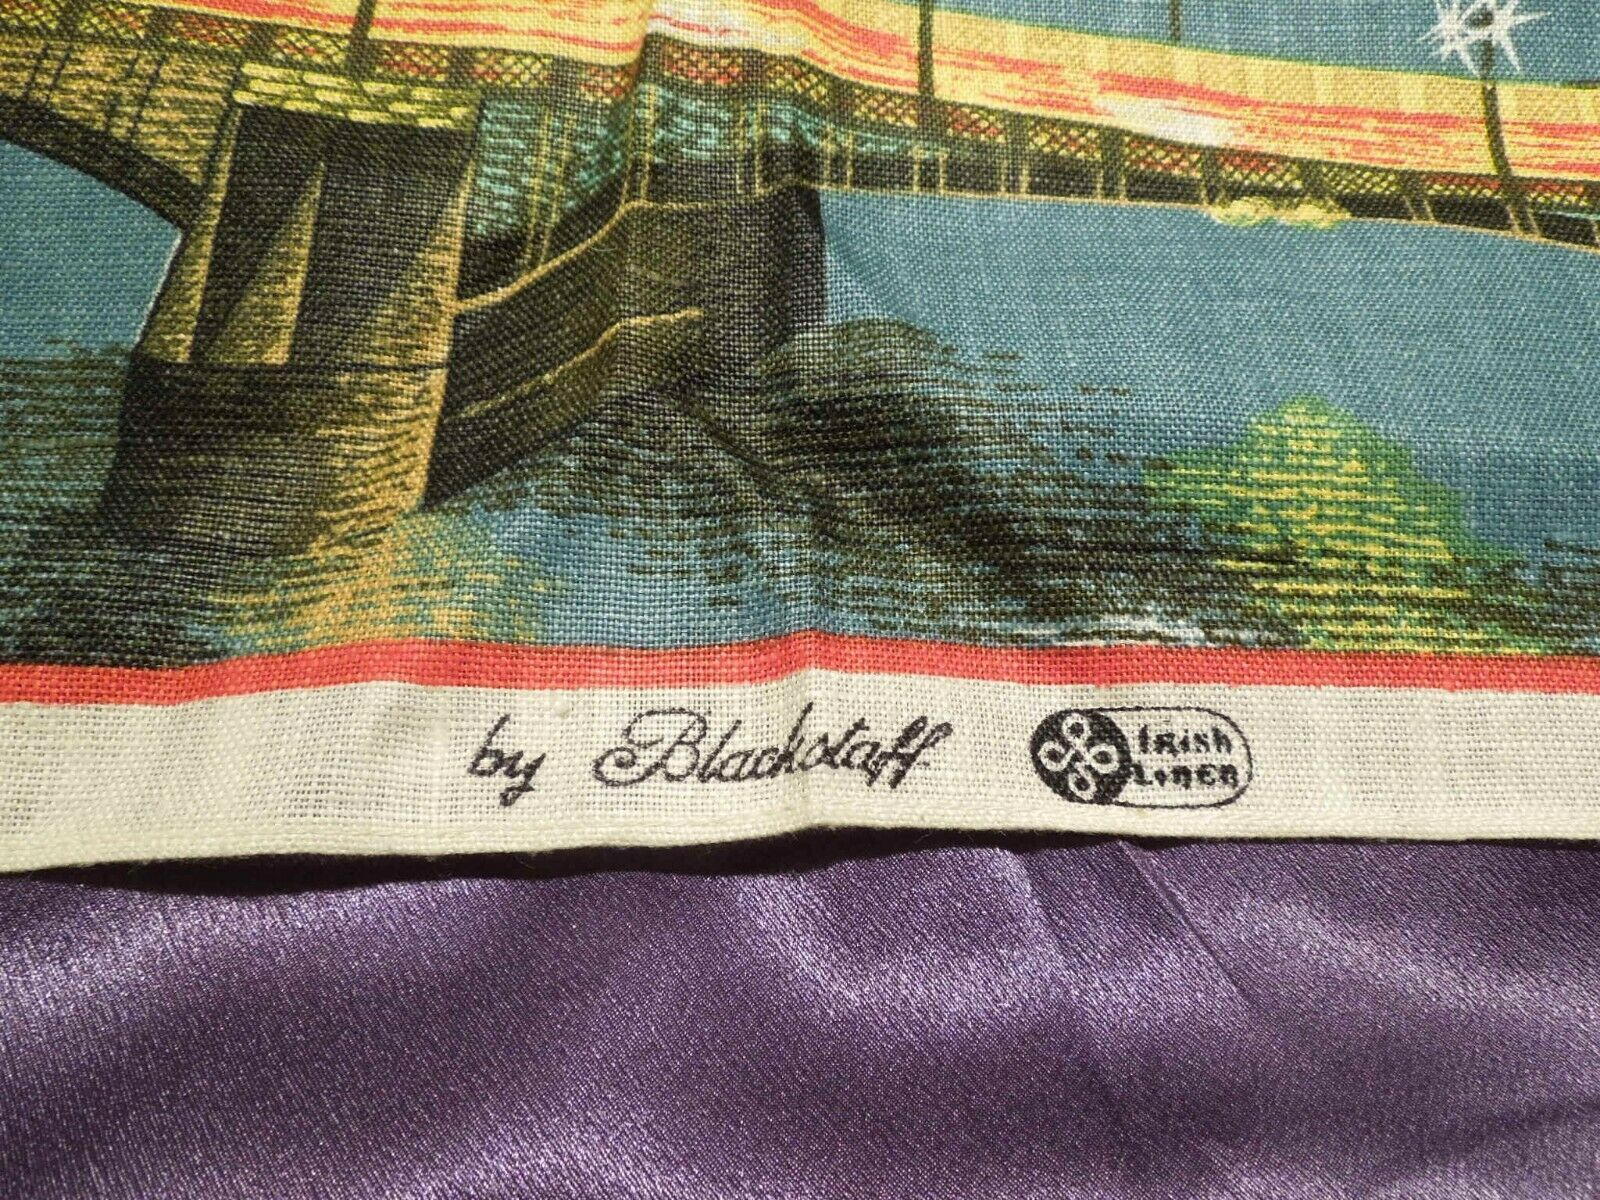 Vintage London by Night by Blackstaff Pure Irish Linen Towel Art image 5